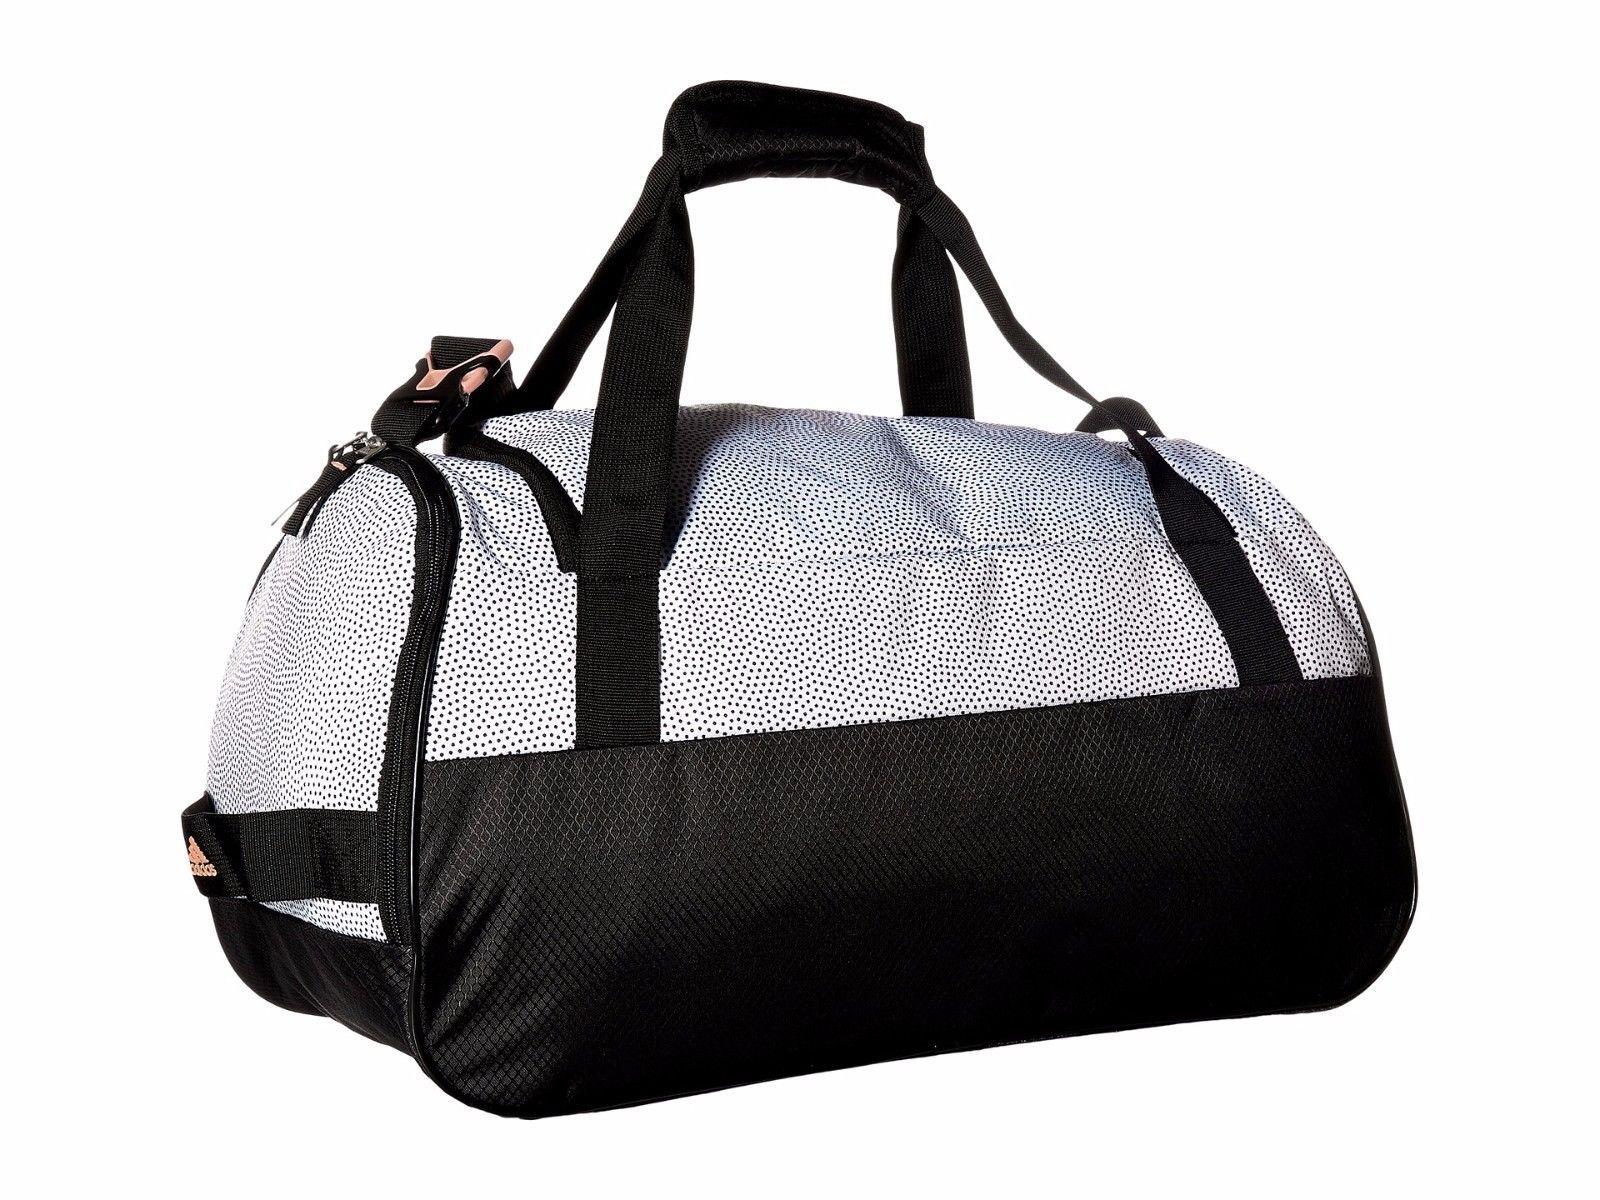 a45c45a58d Nike Brasilia 6 Small Duffel Bag Amazon